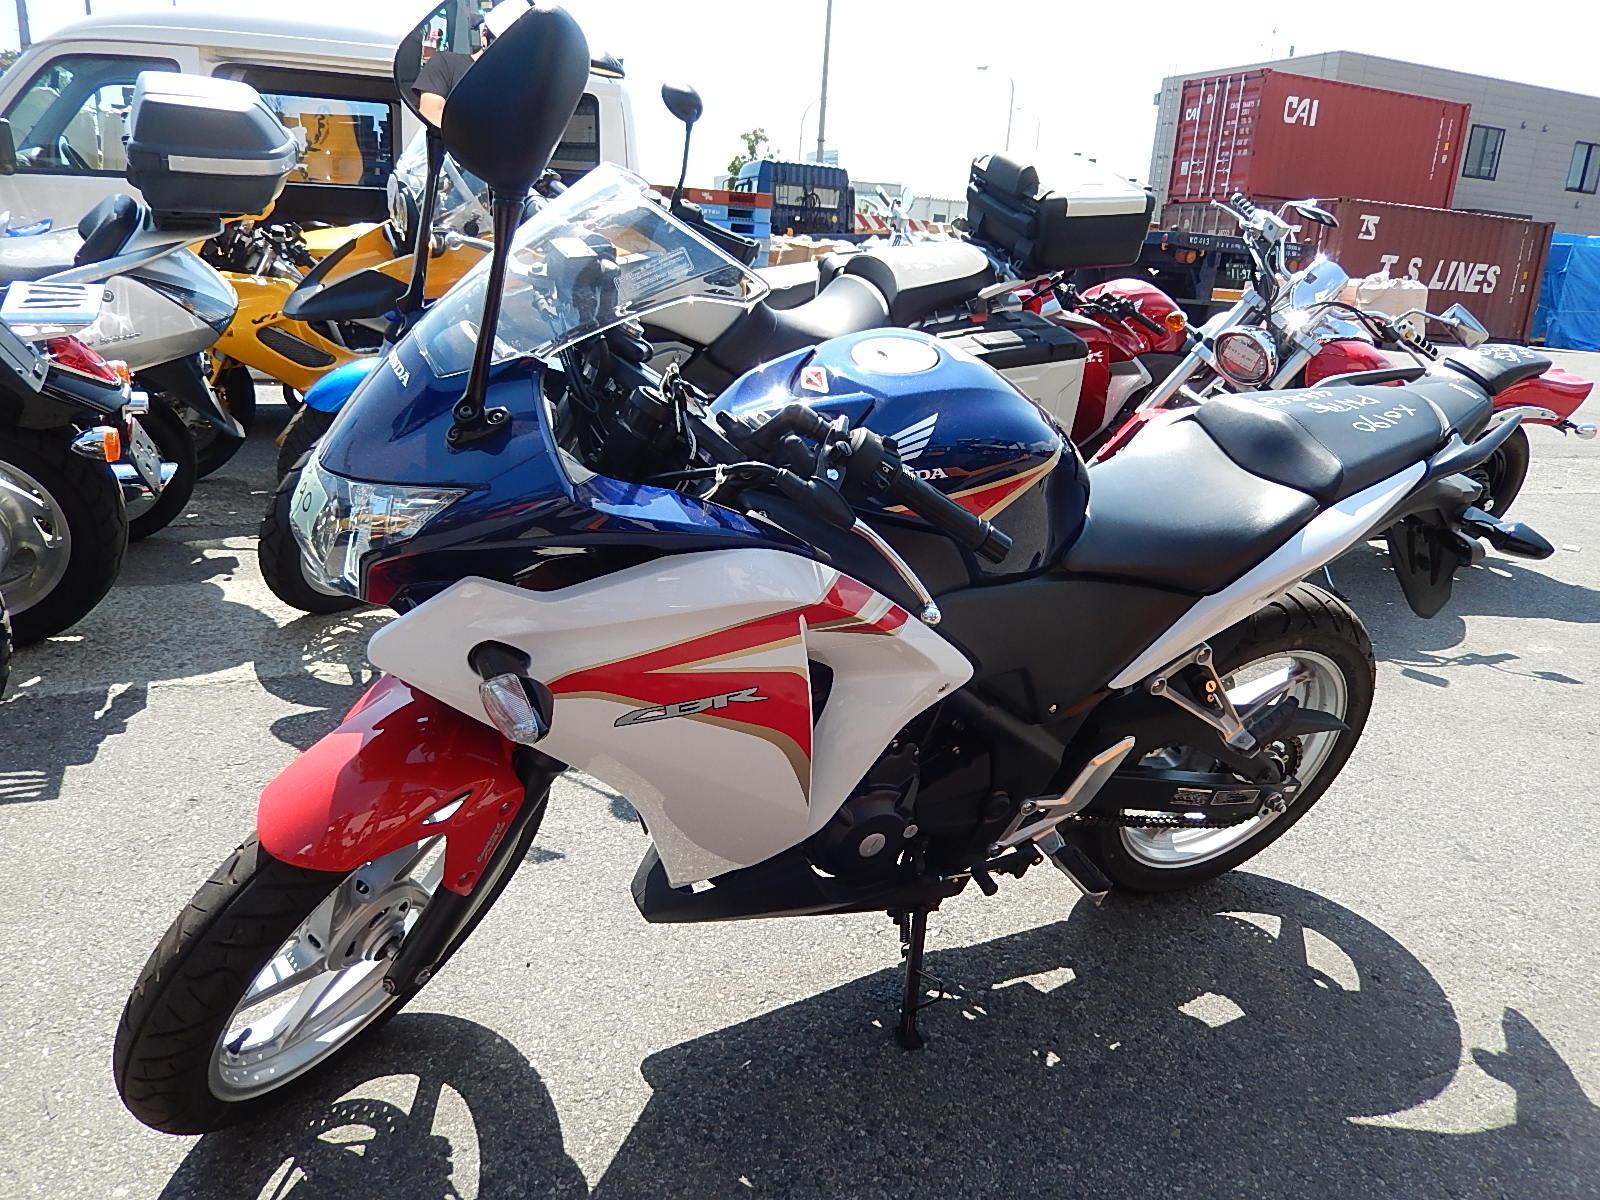 мотоциклы HONDA CBR250R ABS фото 2 увеличить